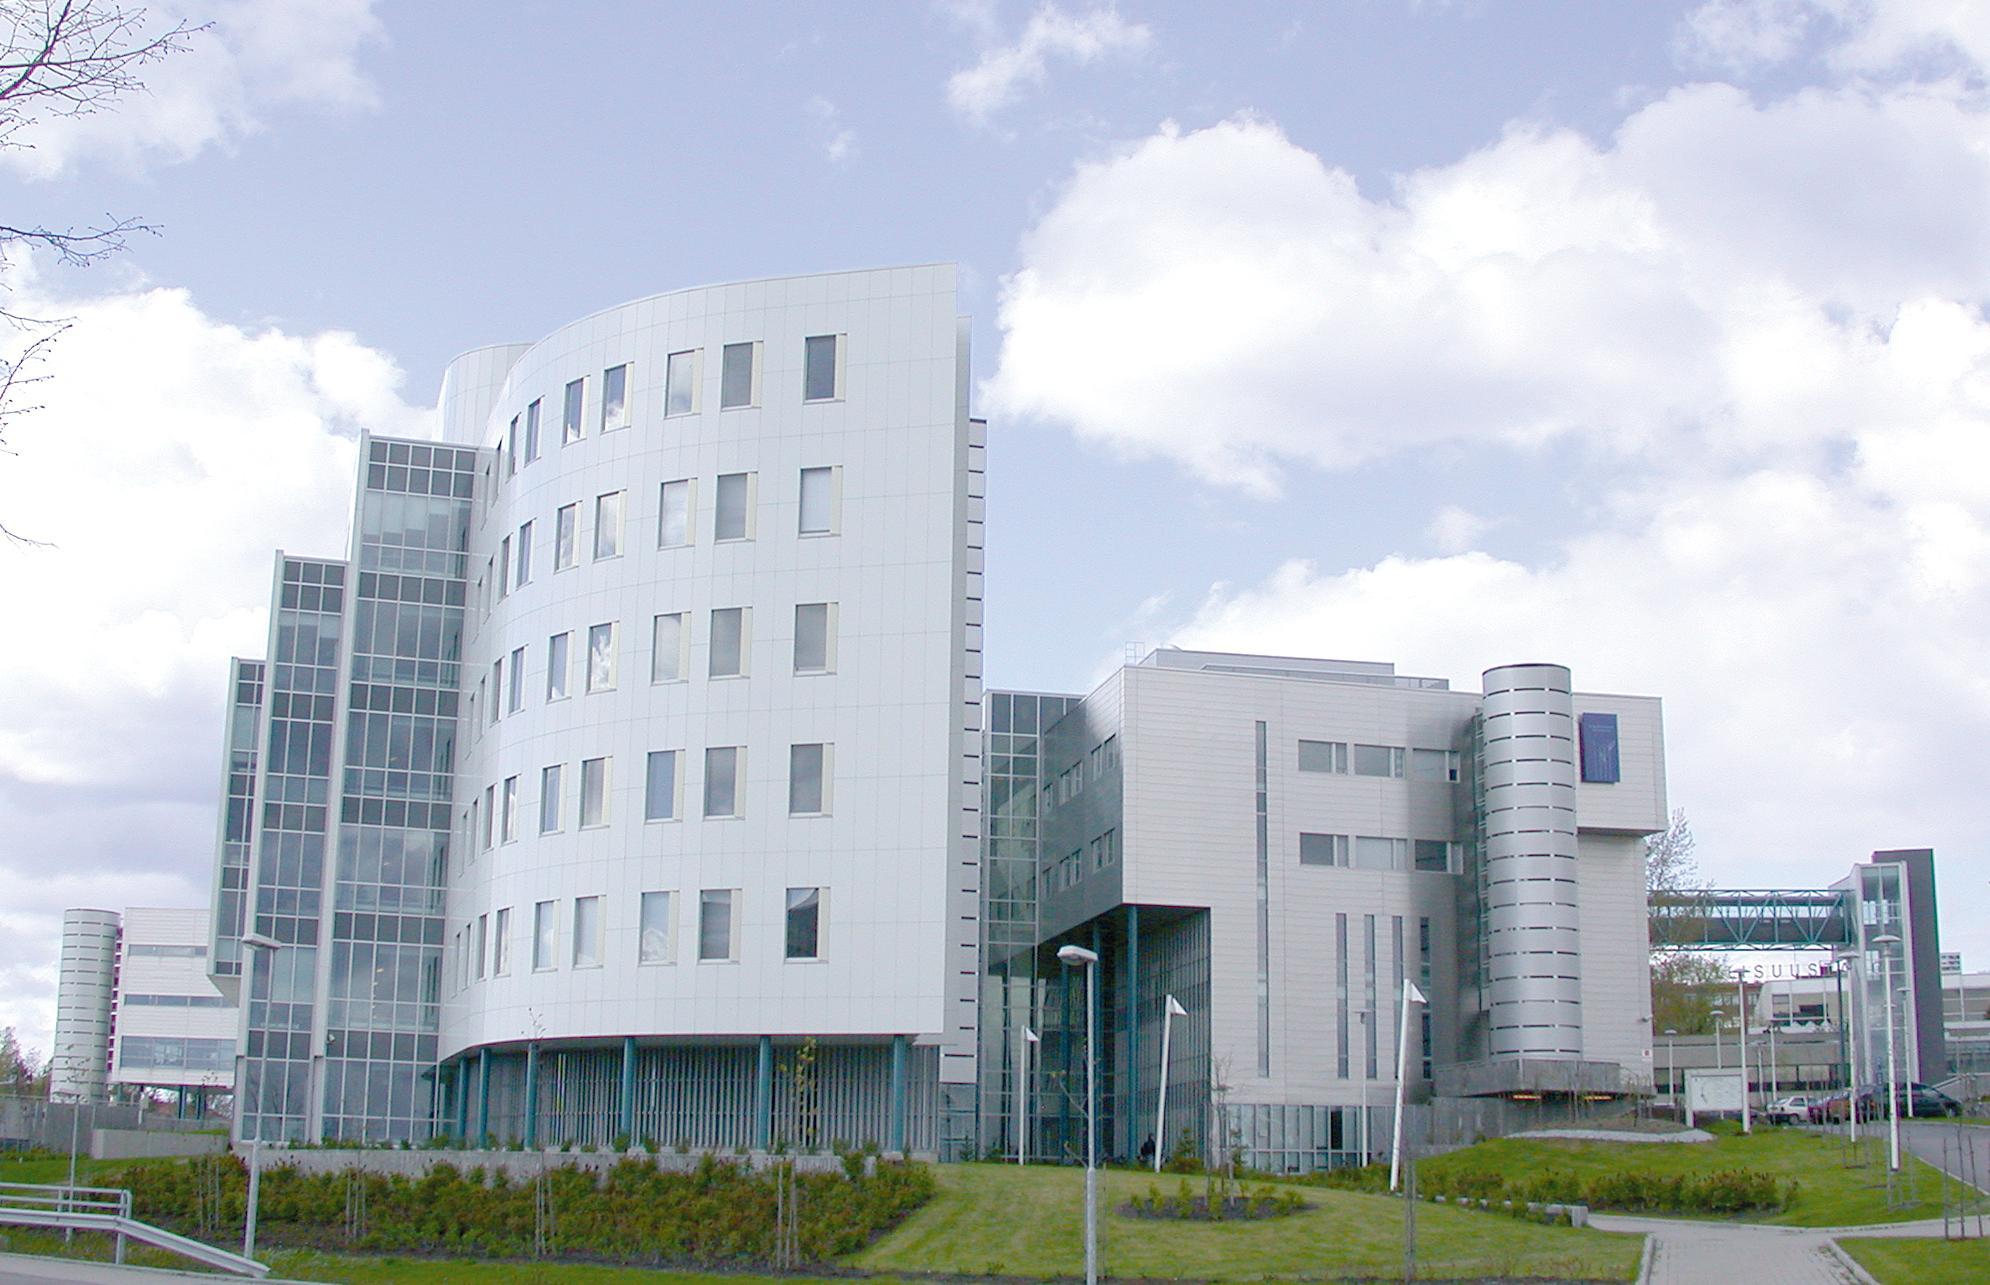 Tampereen Yliopisto, Pinni B -rakennus, Tampere